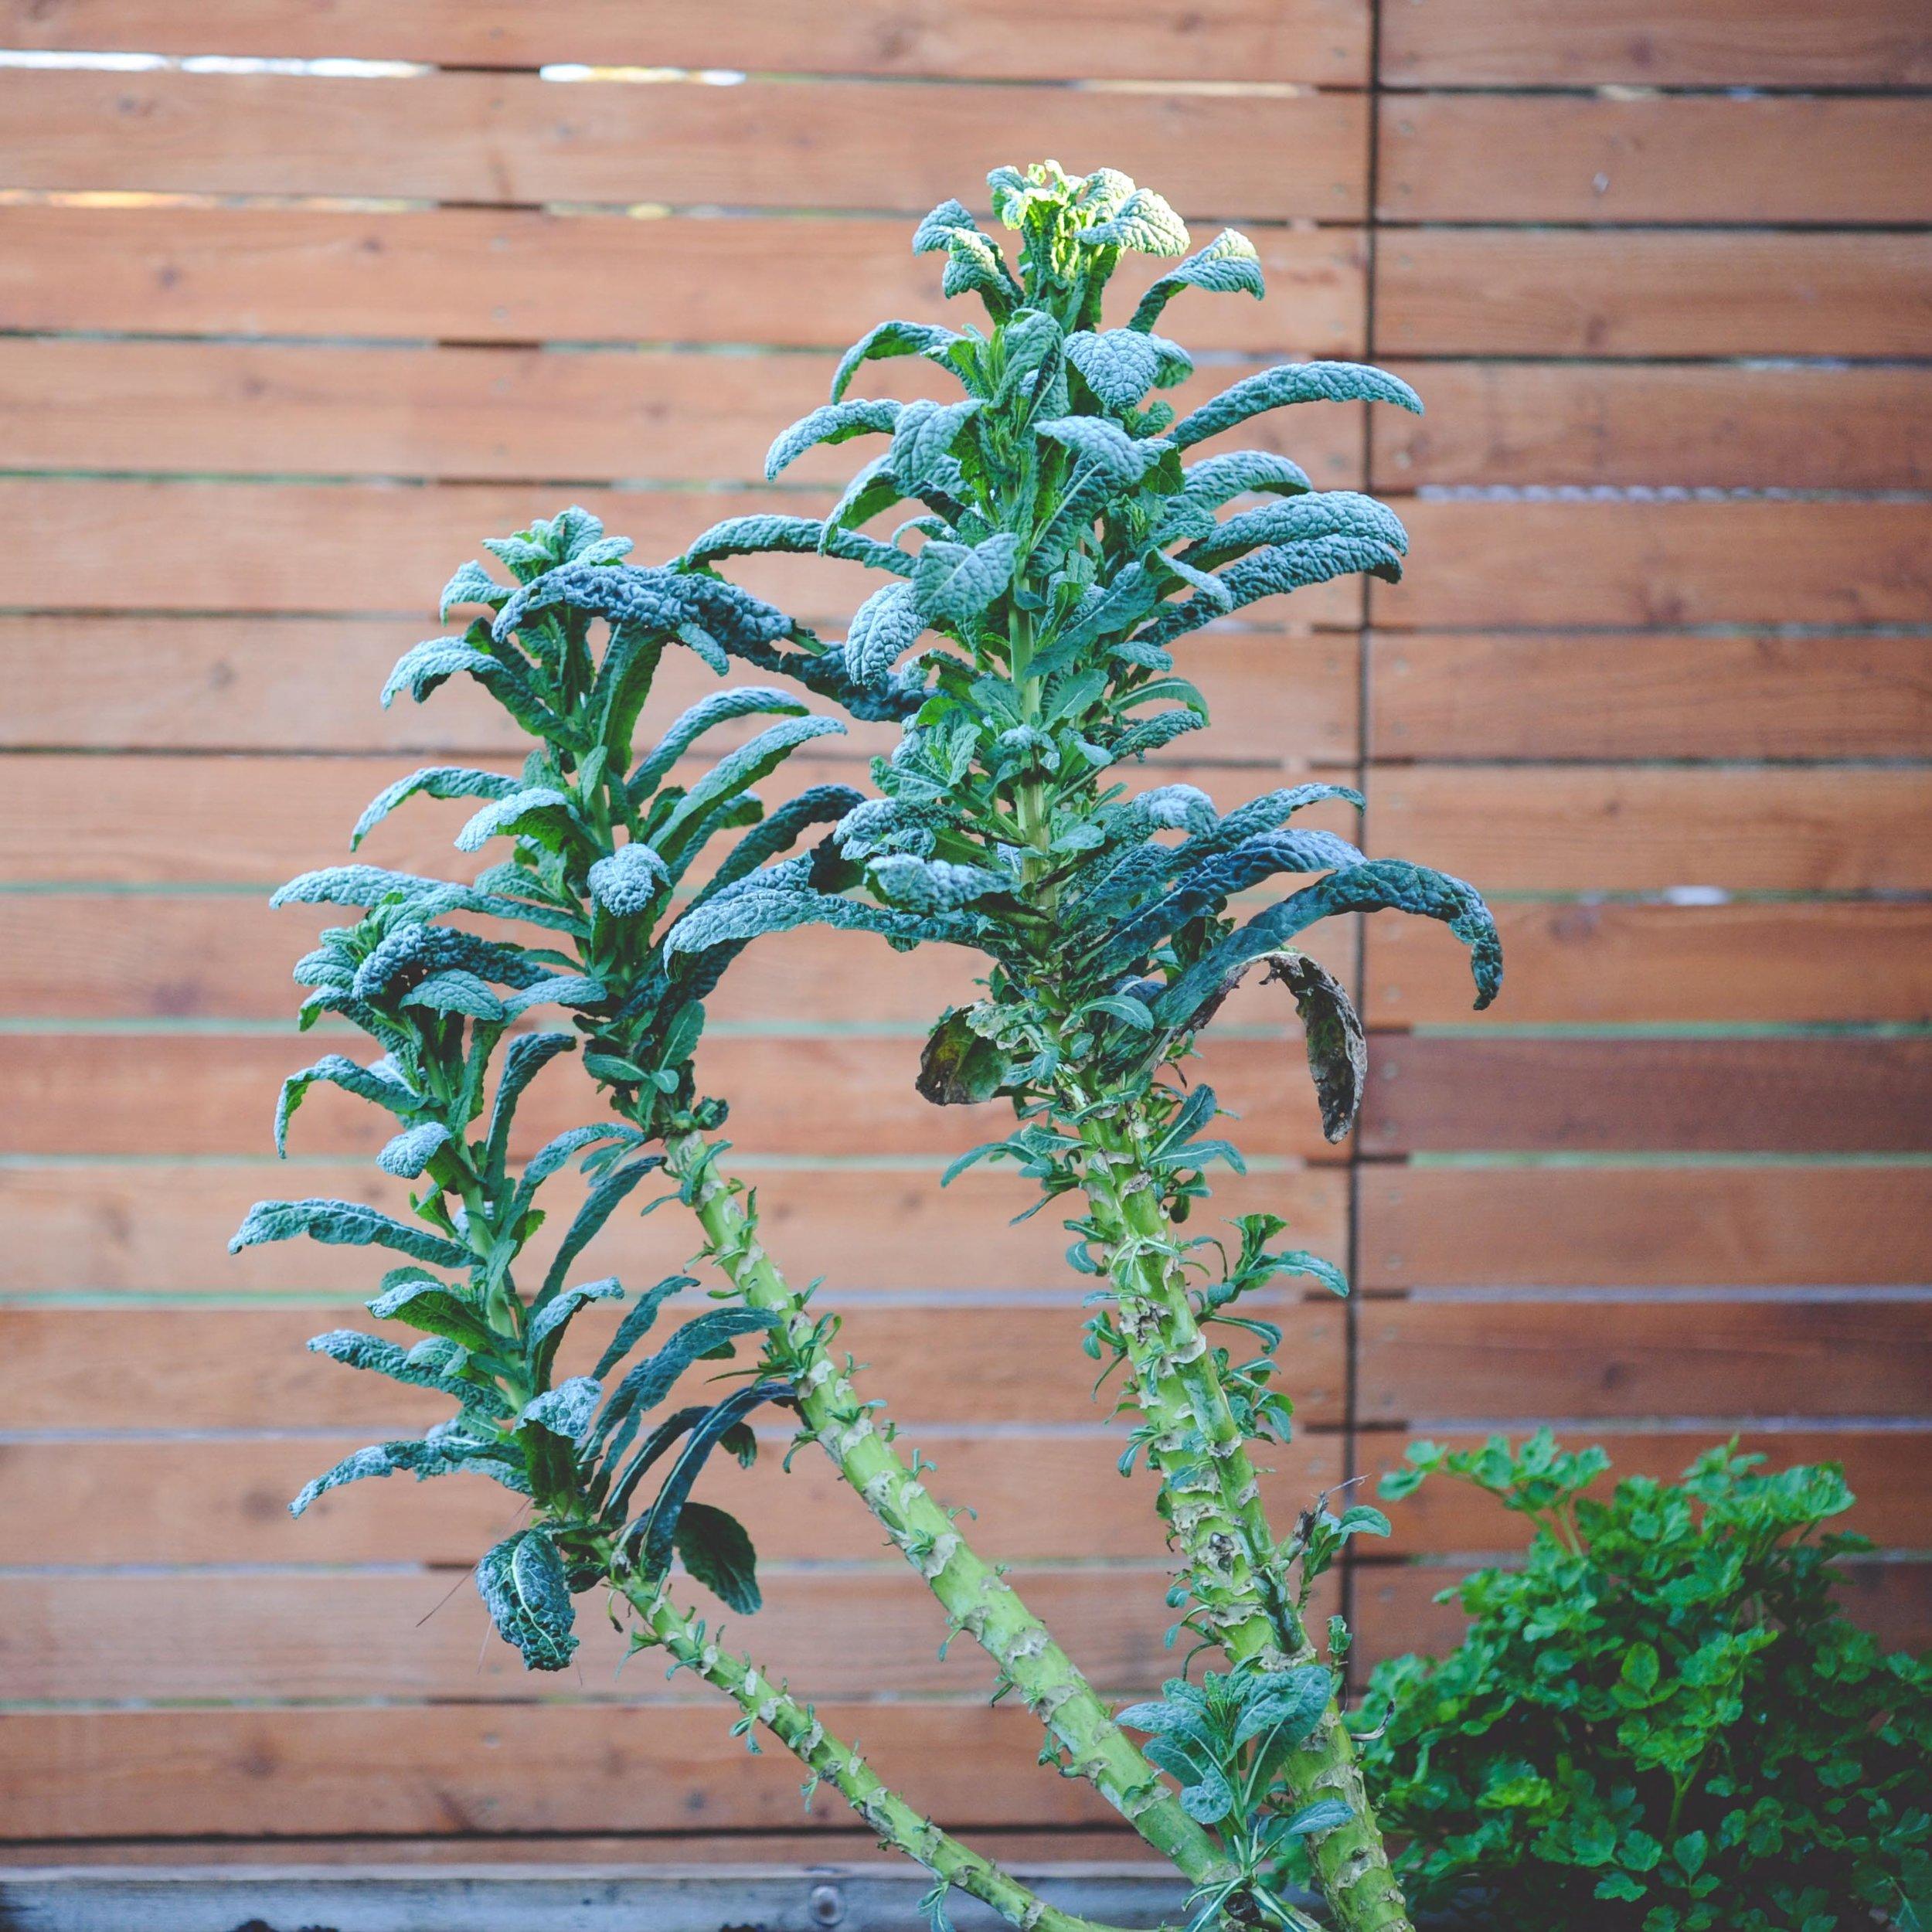 Kale trees!!